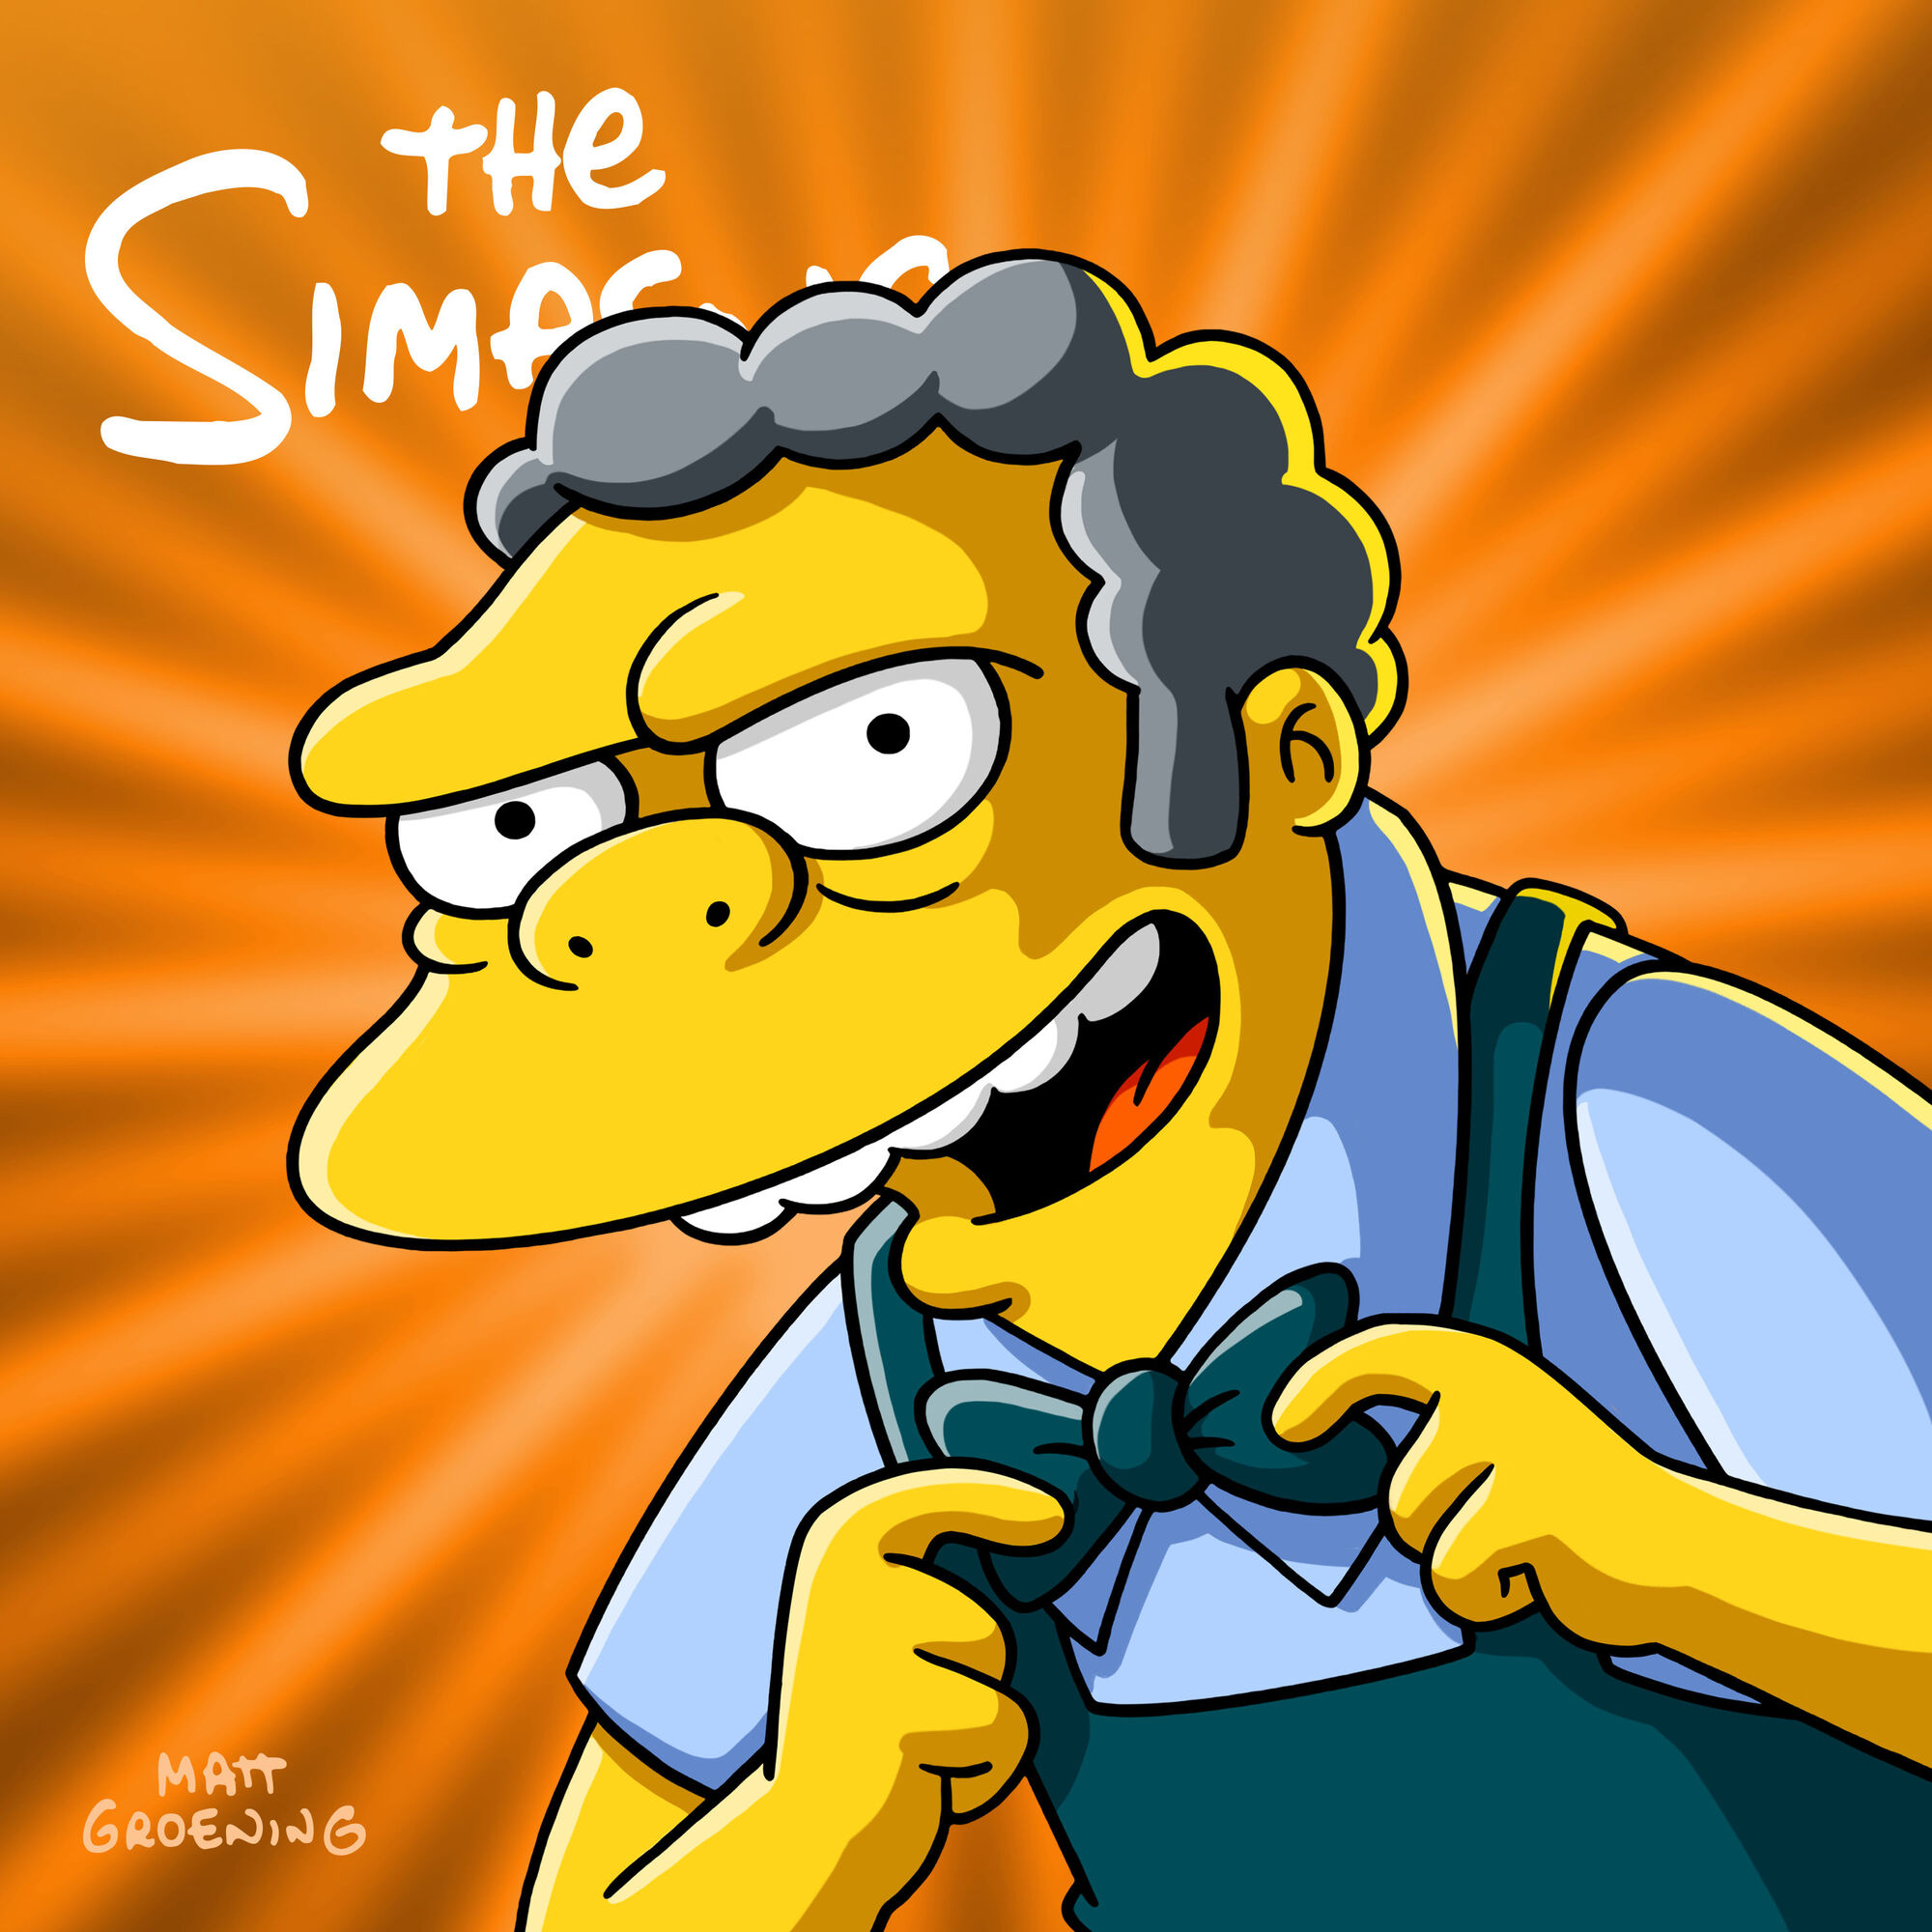 simpsons season 19 episode 14 online